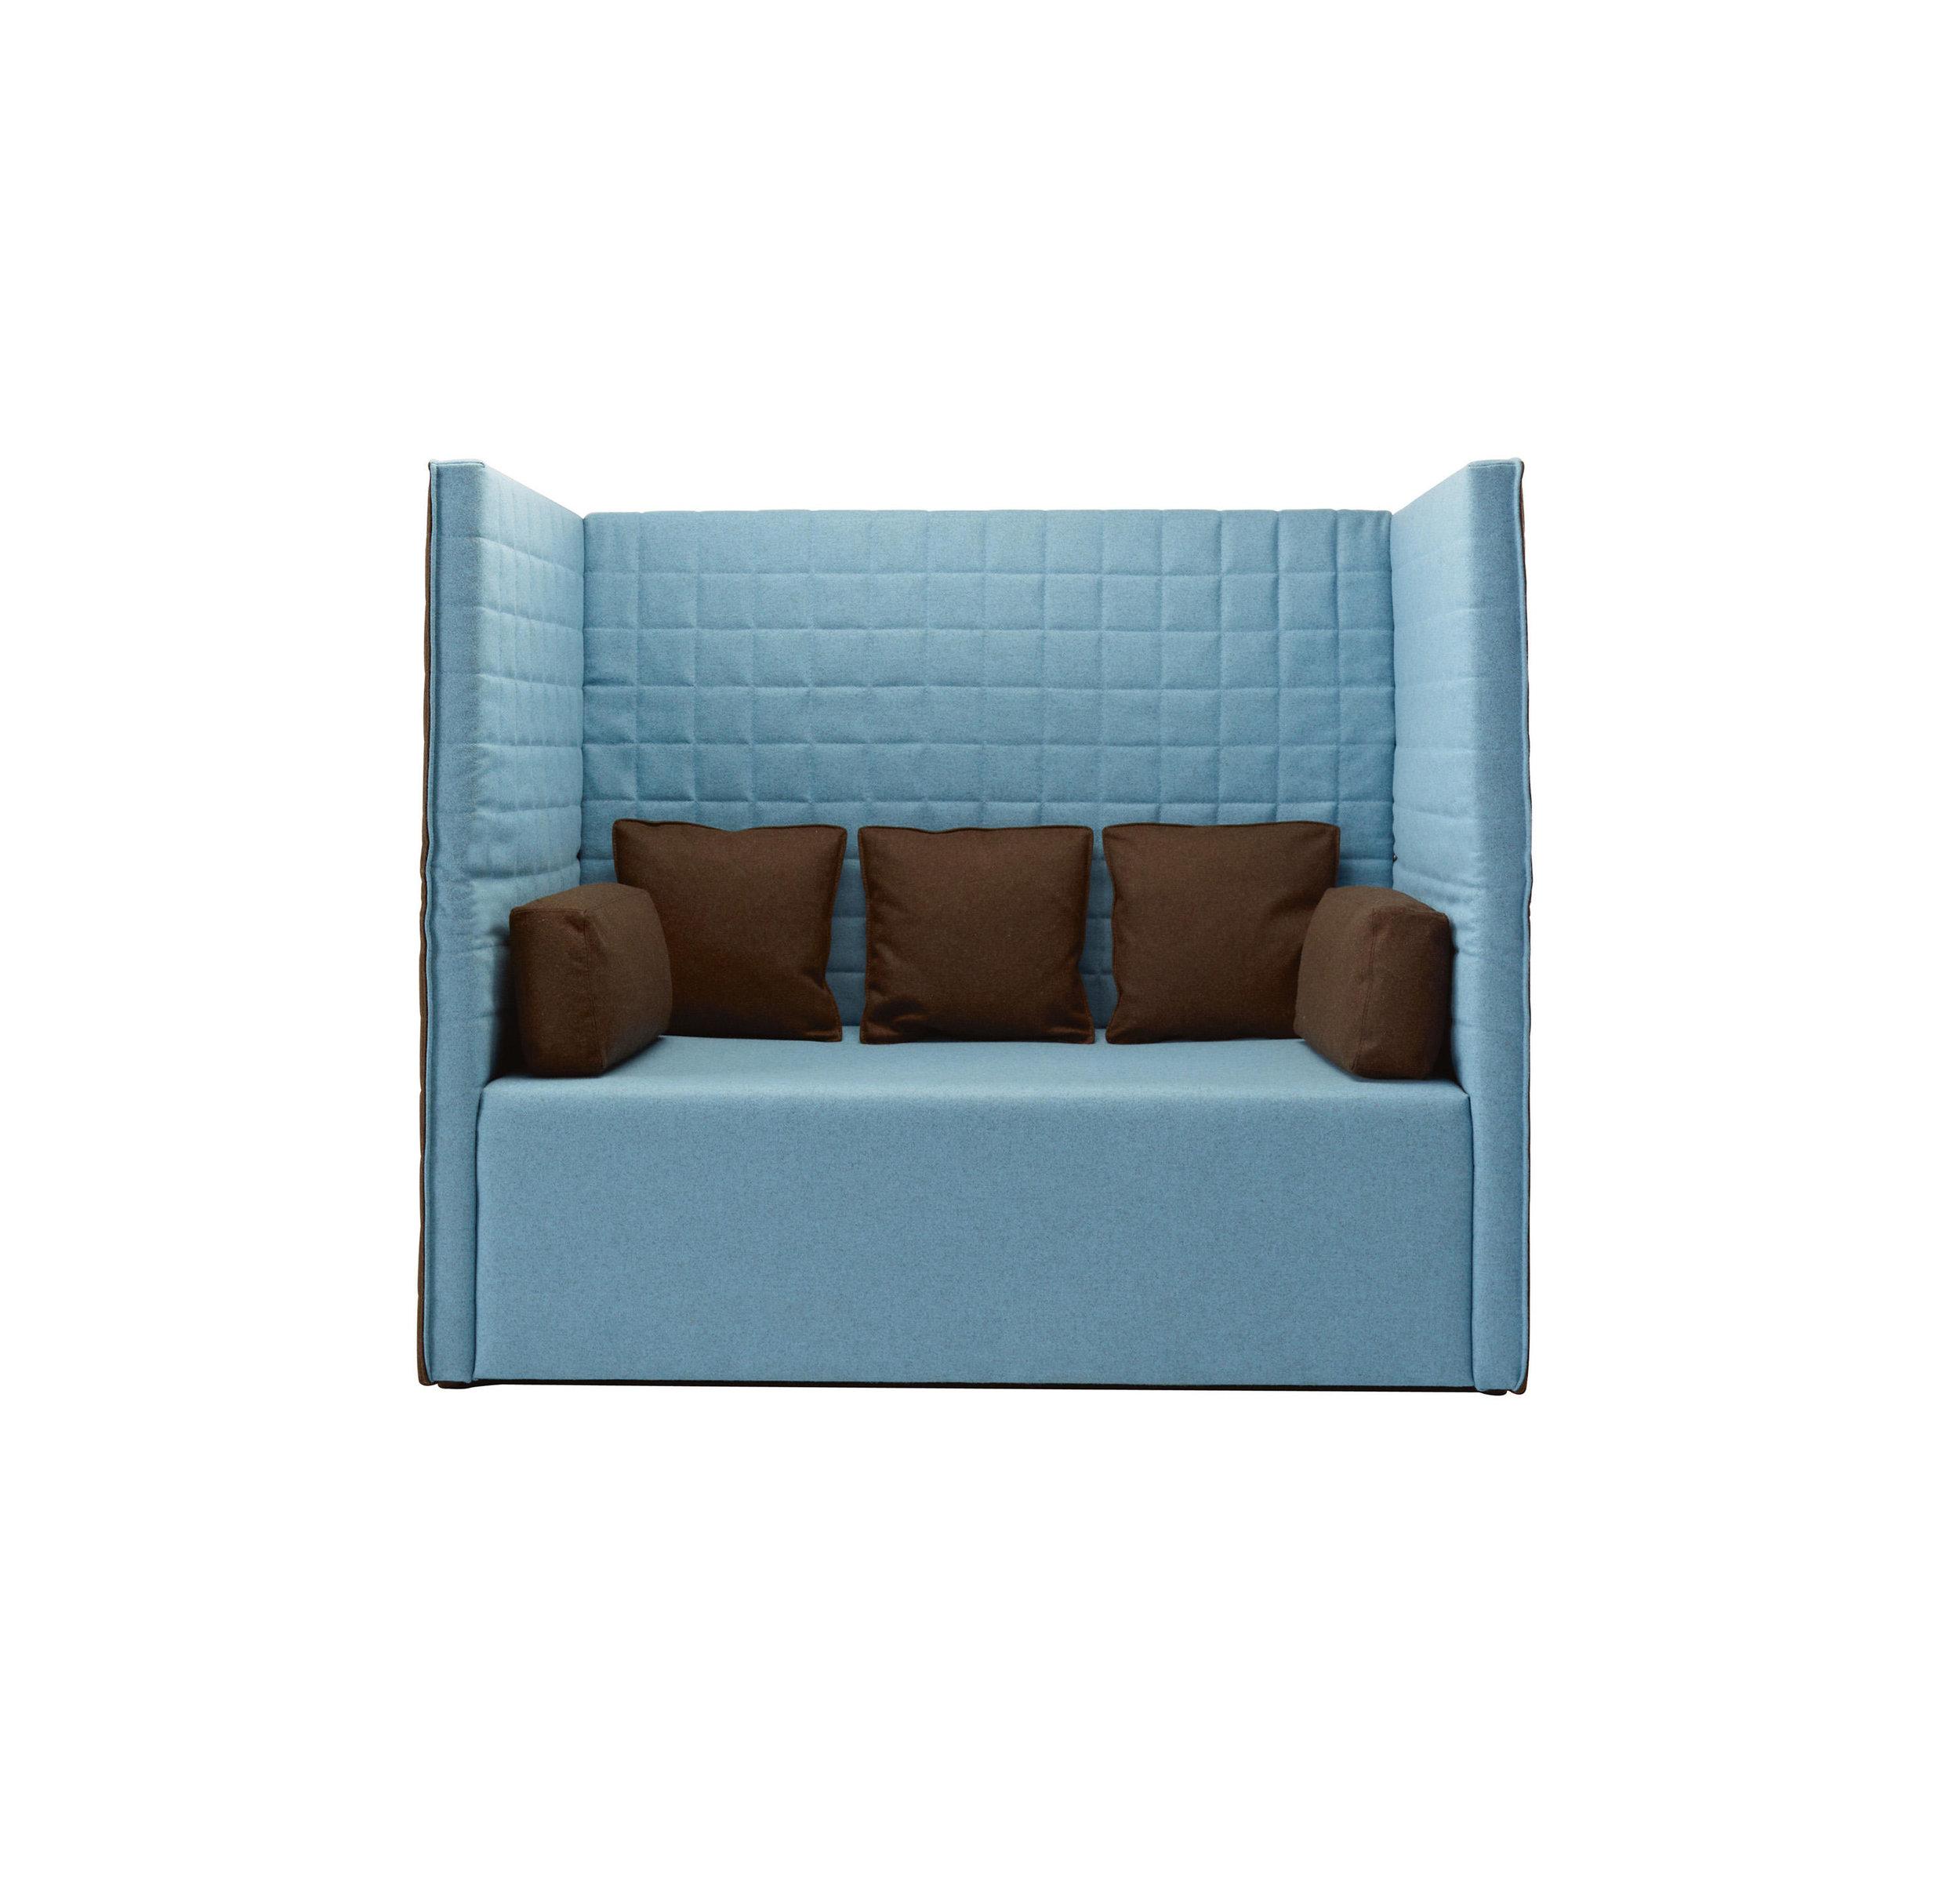 Guialmi Marea foldable sofas